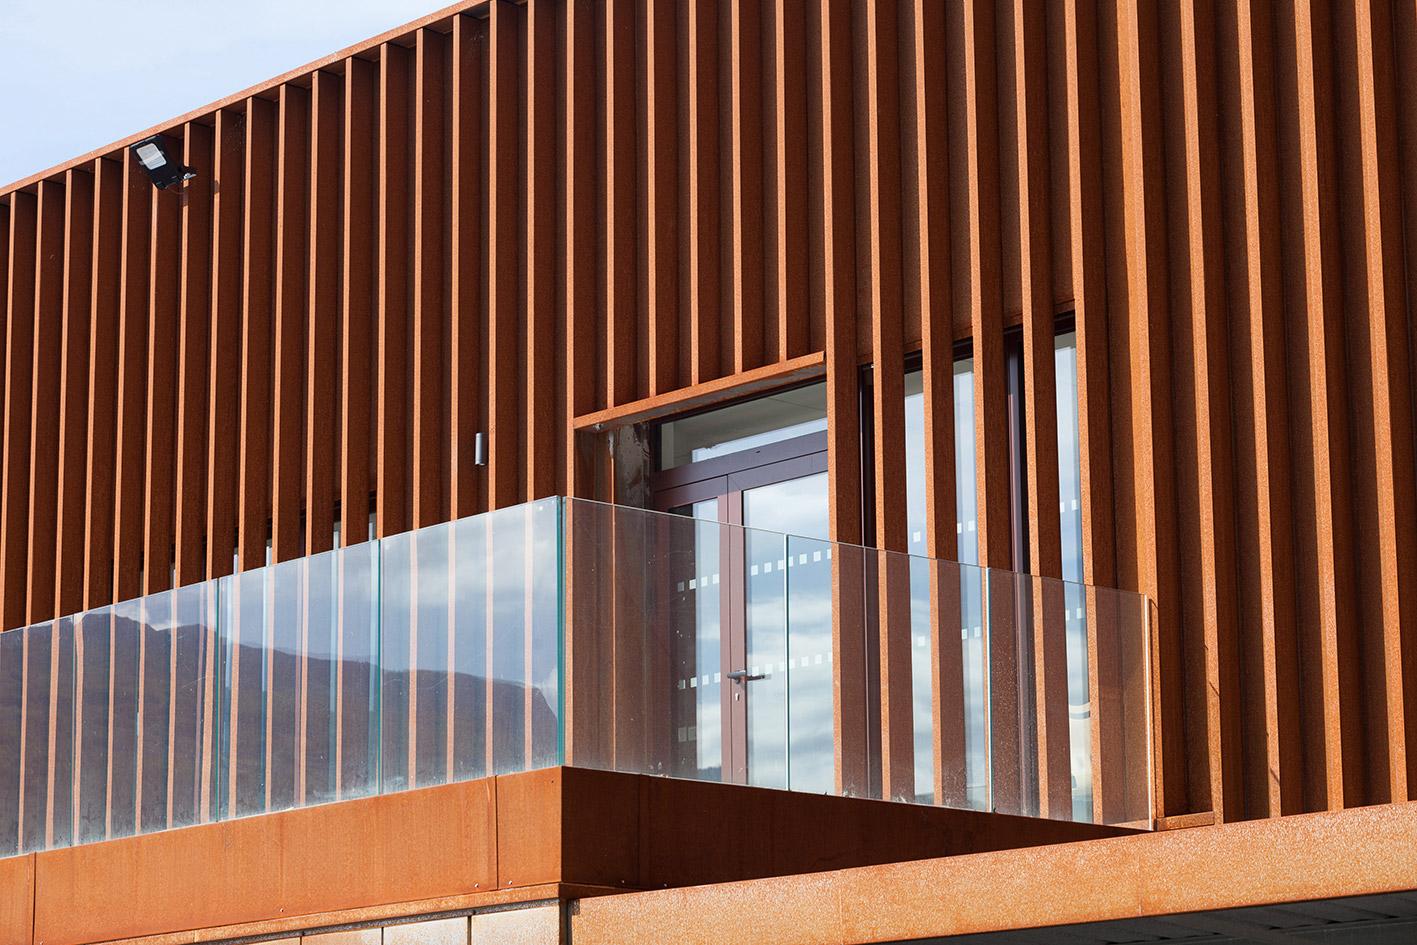 jerome-ricolleau-photographe-architecture-lyon-Composite-grenoble-sdis-caserne-pompiers-seyssel-10